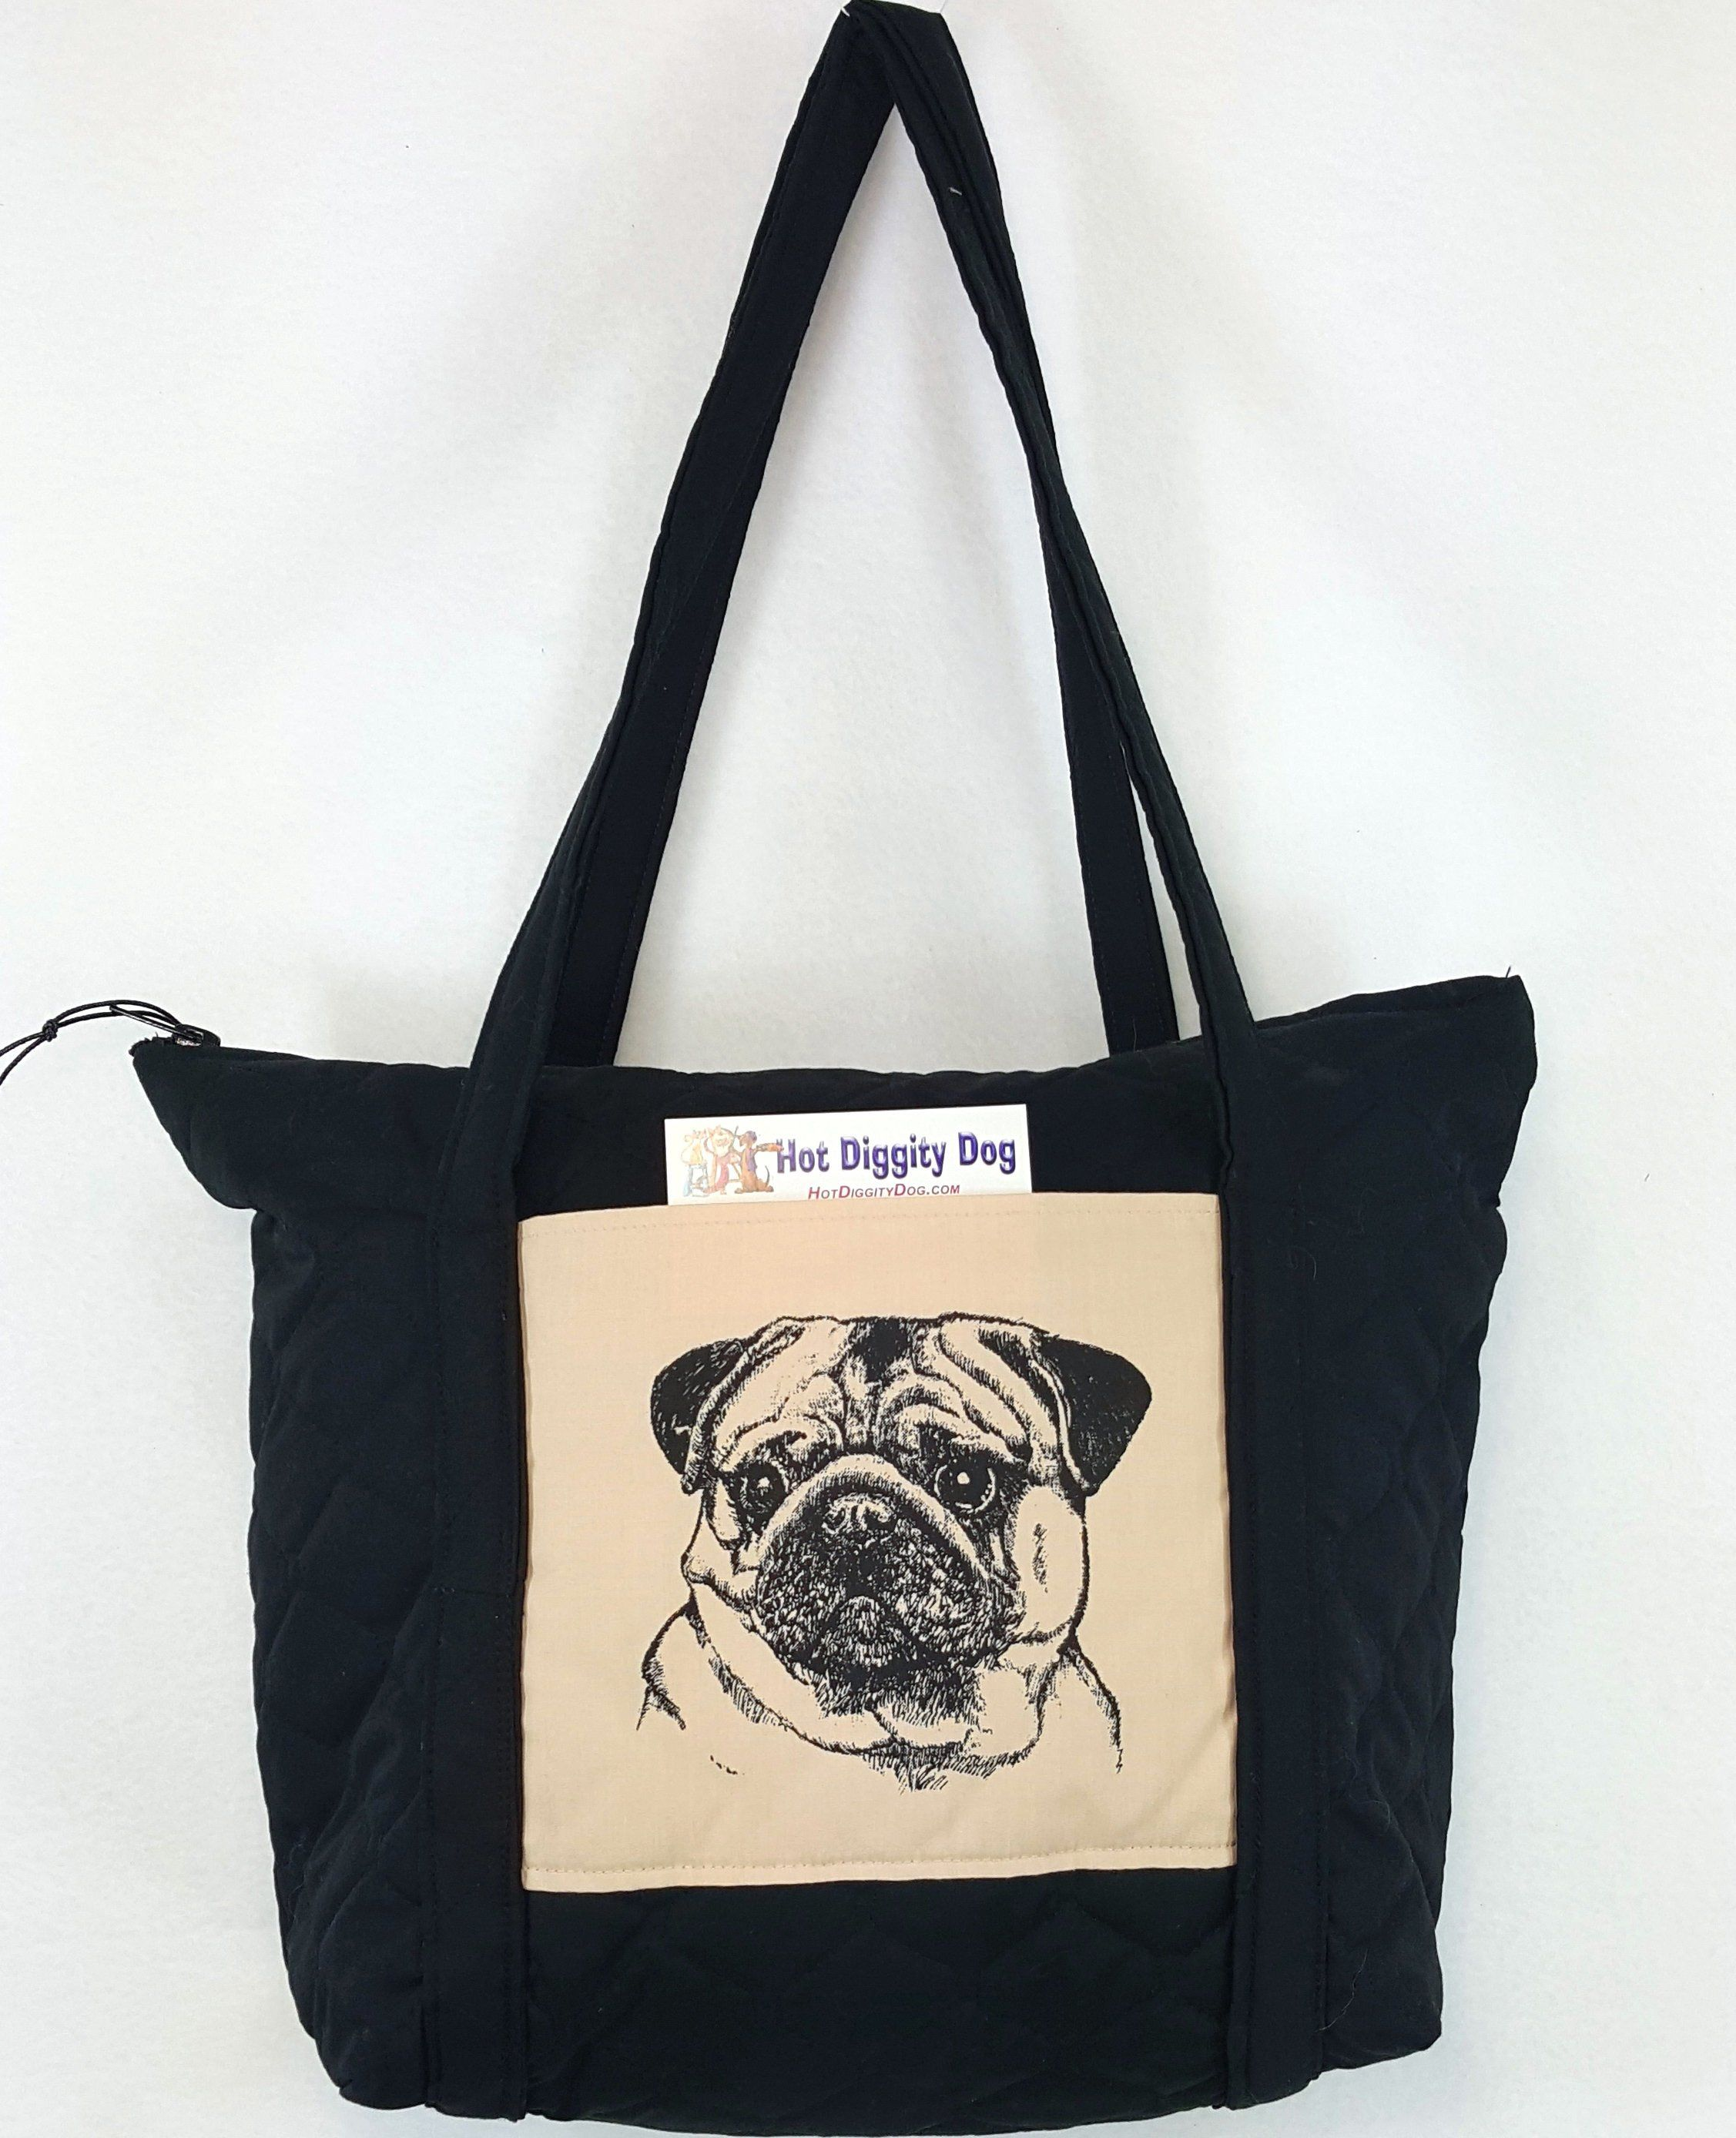 be0912f9174 Pug Handbag Purse Hot Diggity Bags And Purses Handbags Top